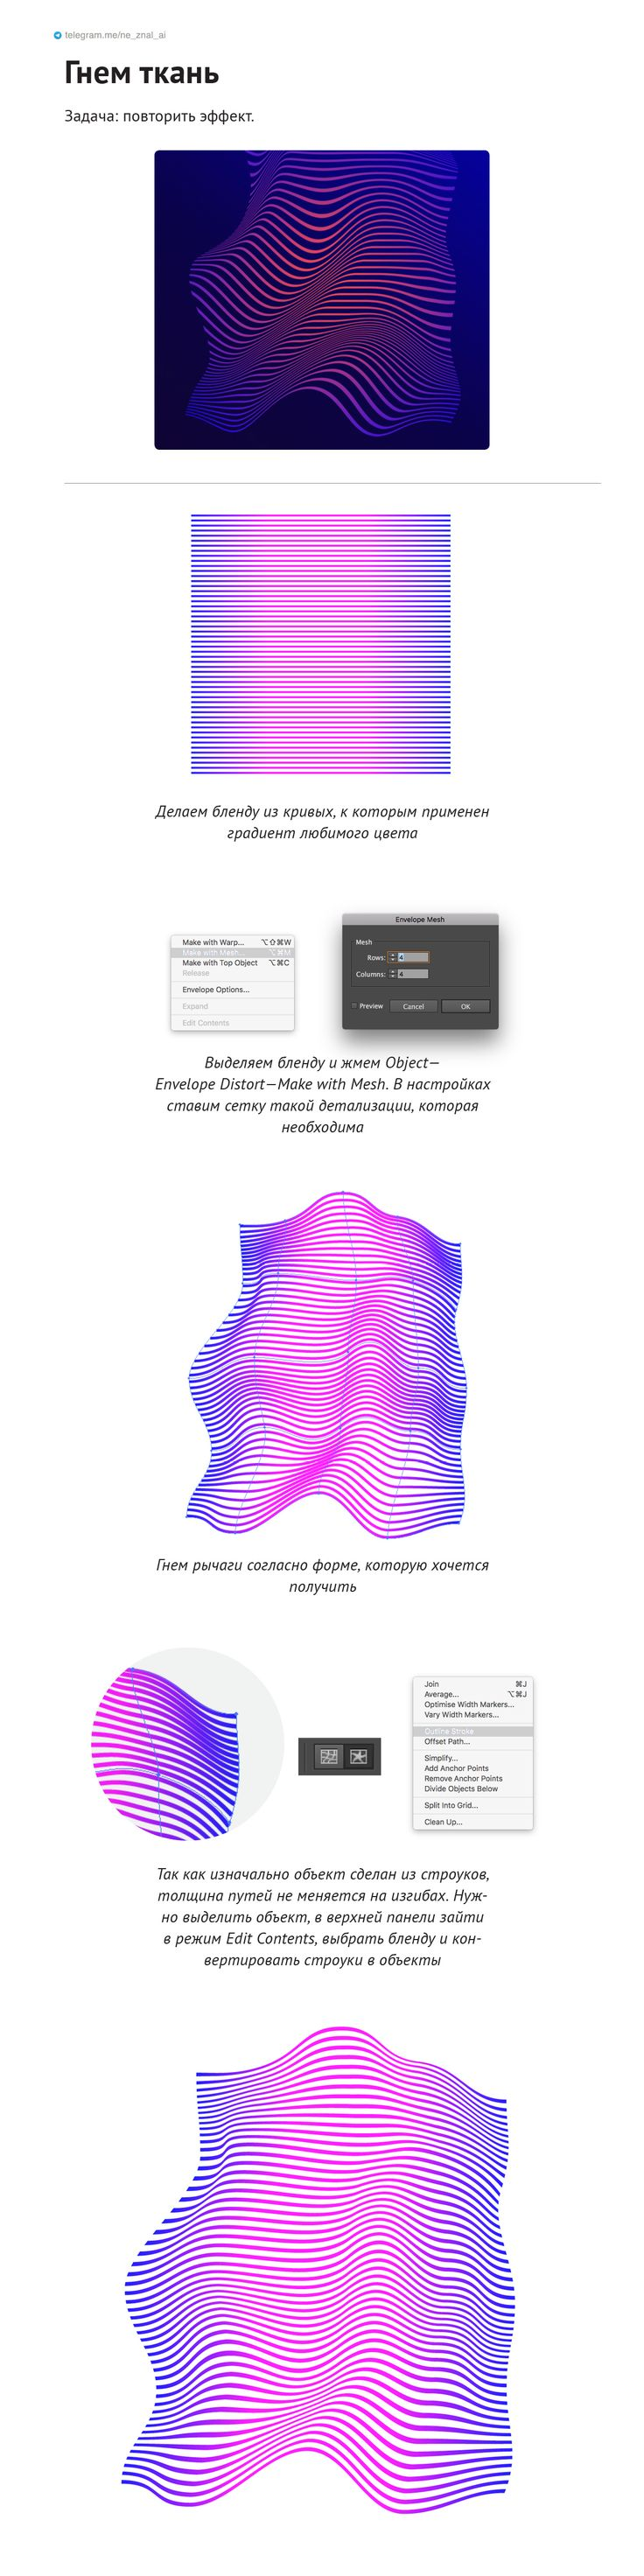 Гнем ткань    AI Tips Cards